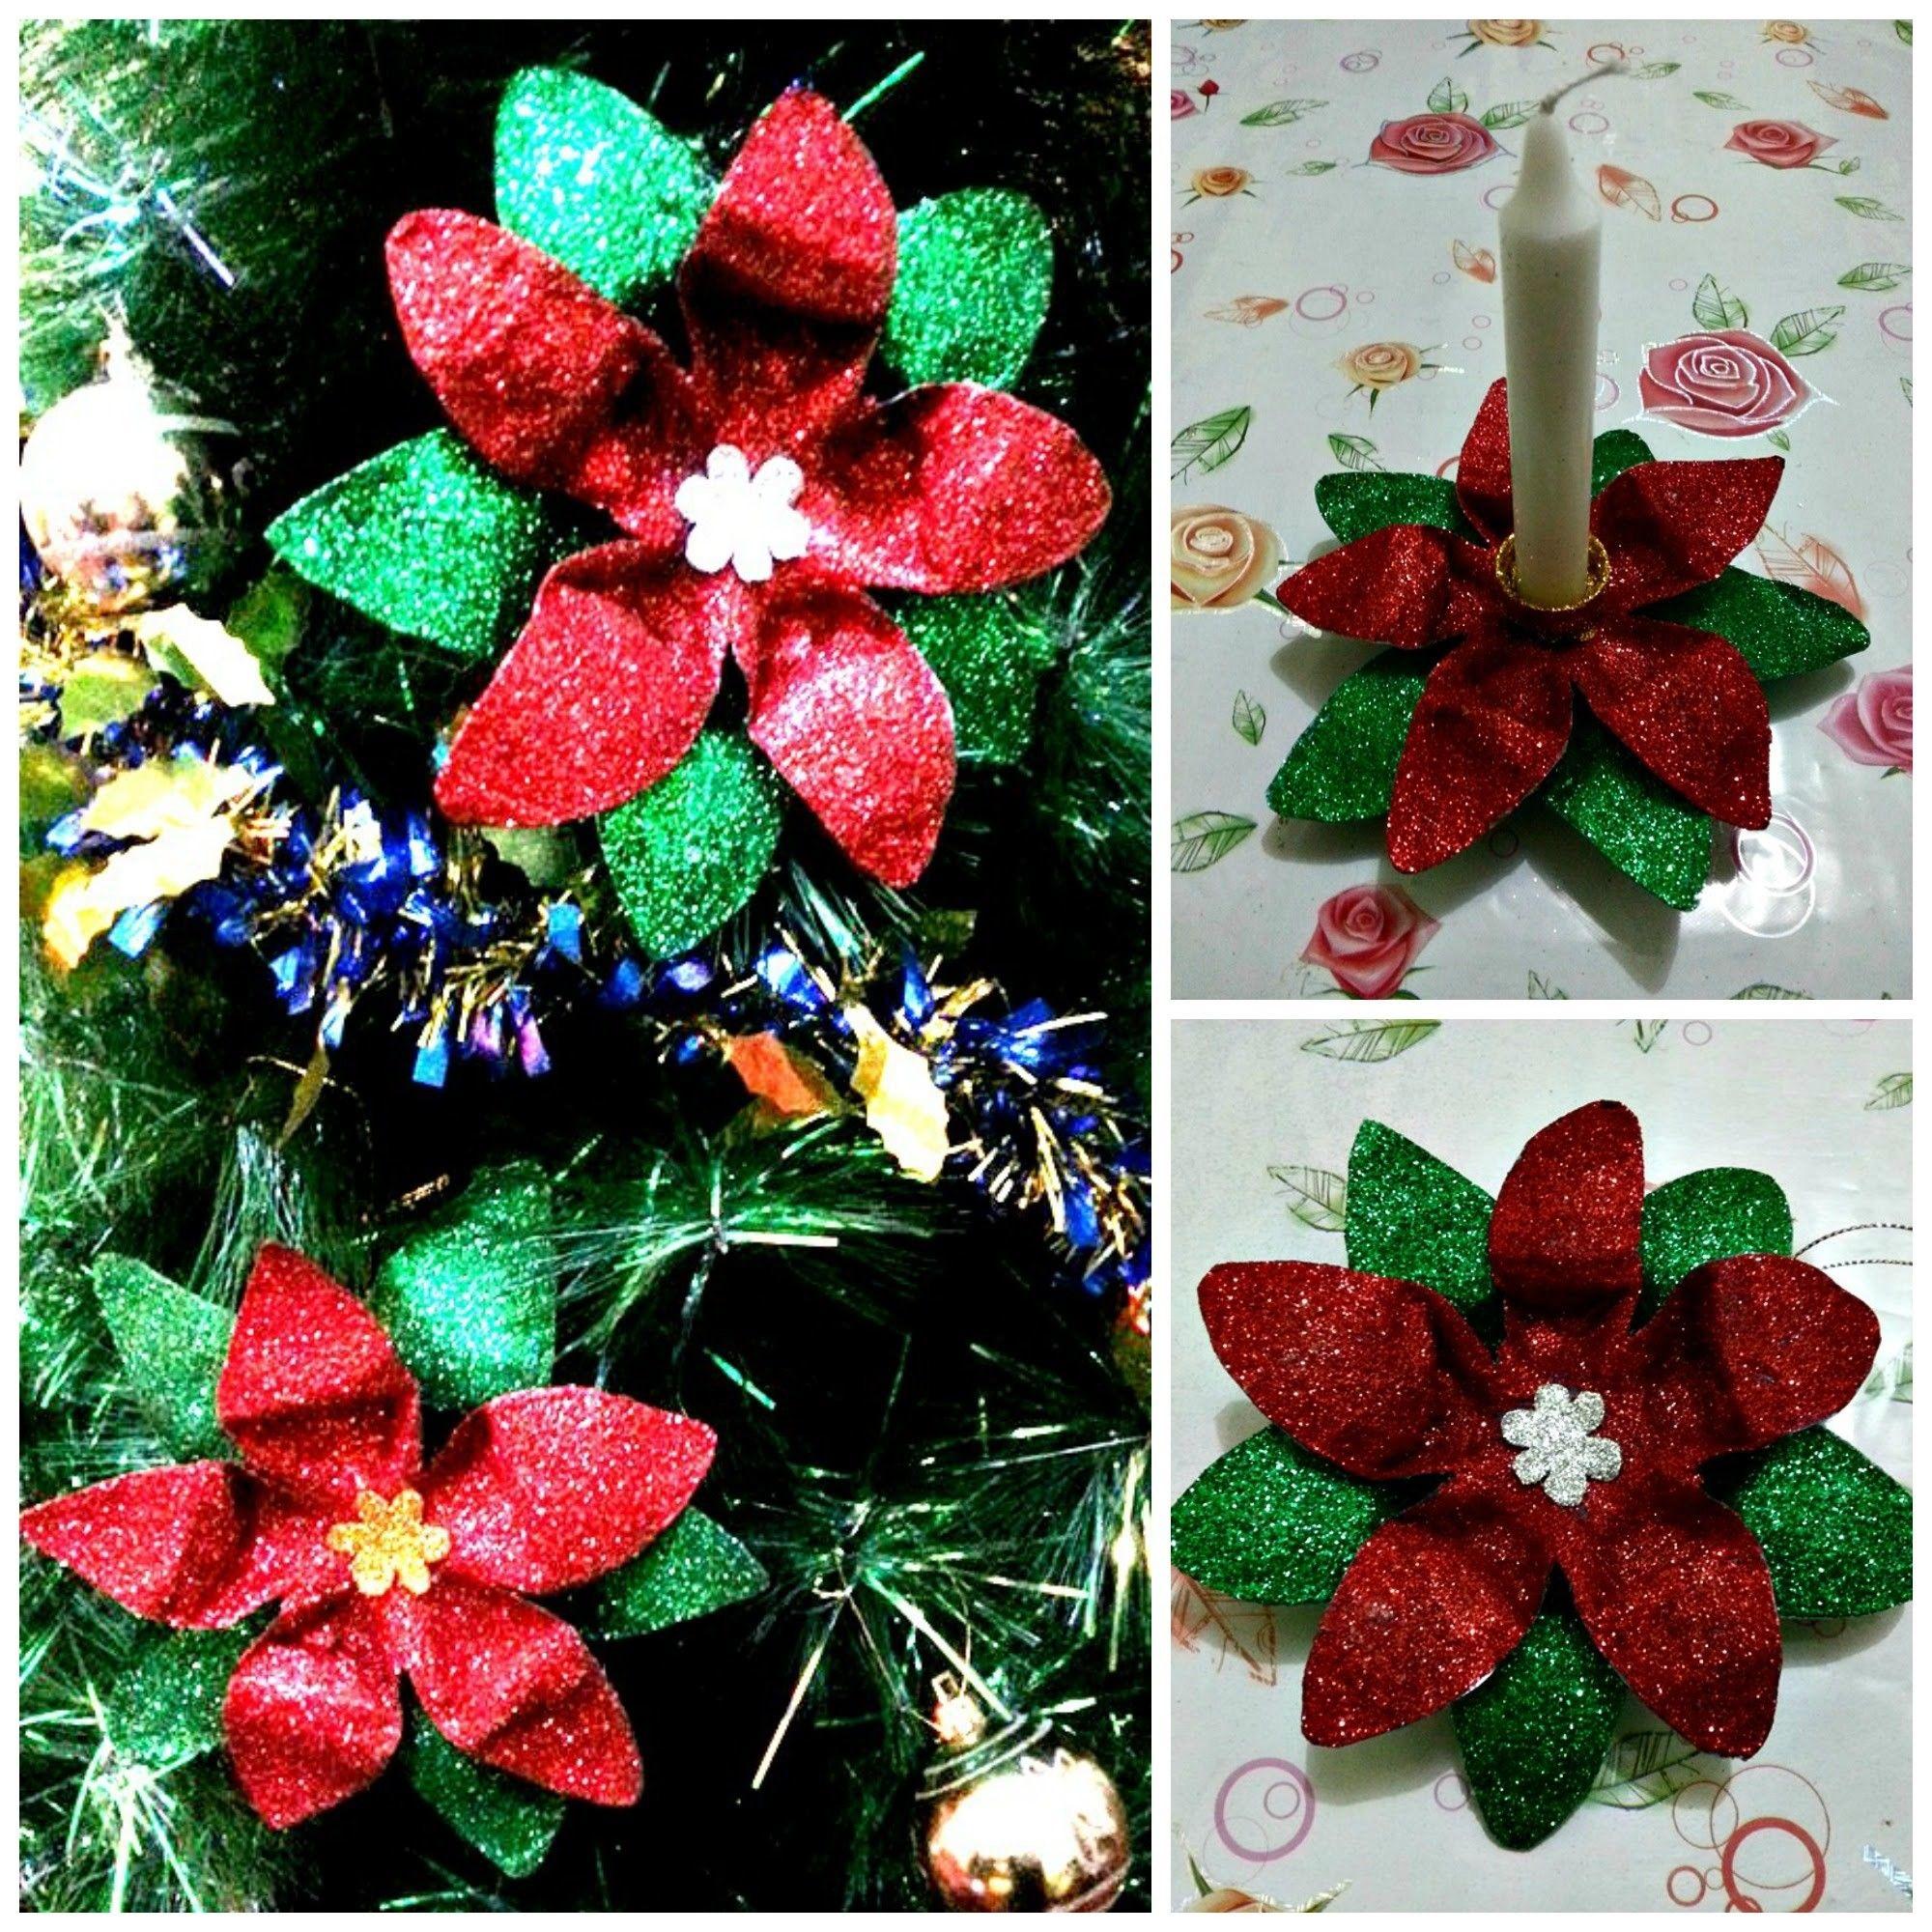 Diy 19 Poinsettia 2 In 1 Made Of Plastic Bottle Bottle Crafts Plastic Bottle Crafts Christmas Crafts